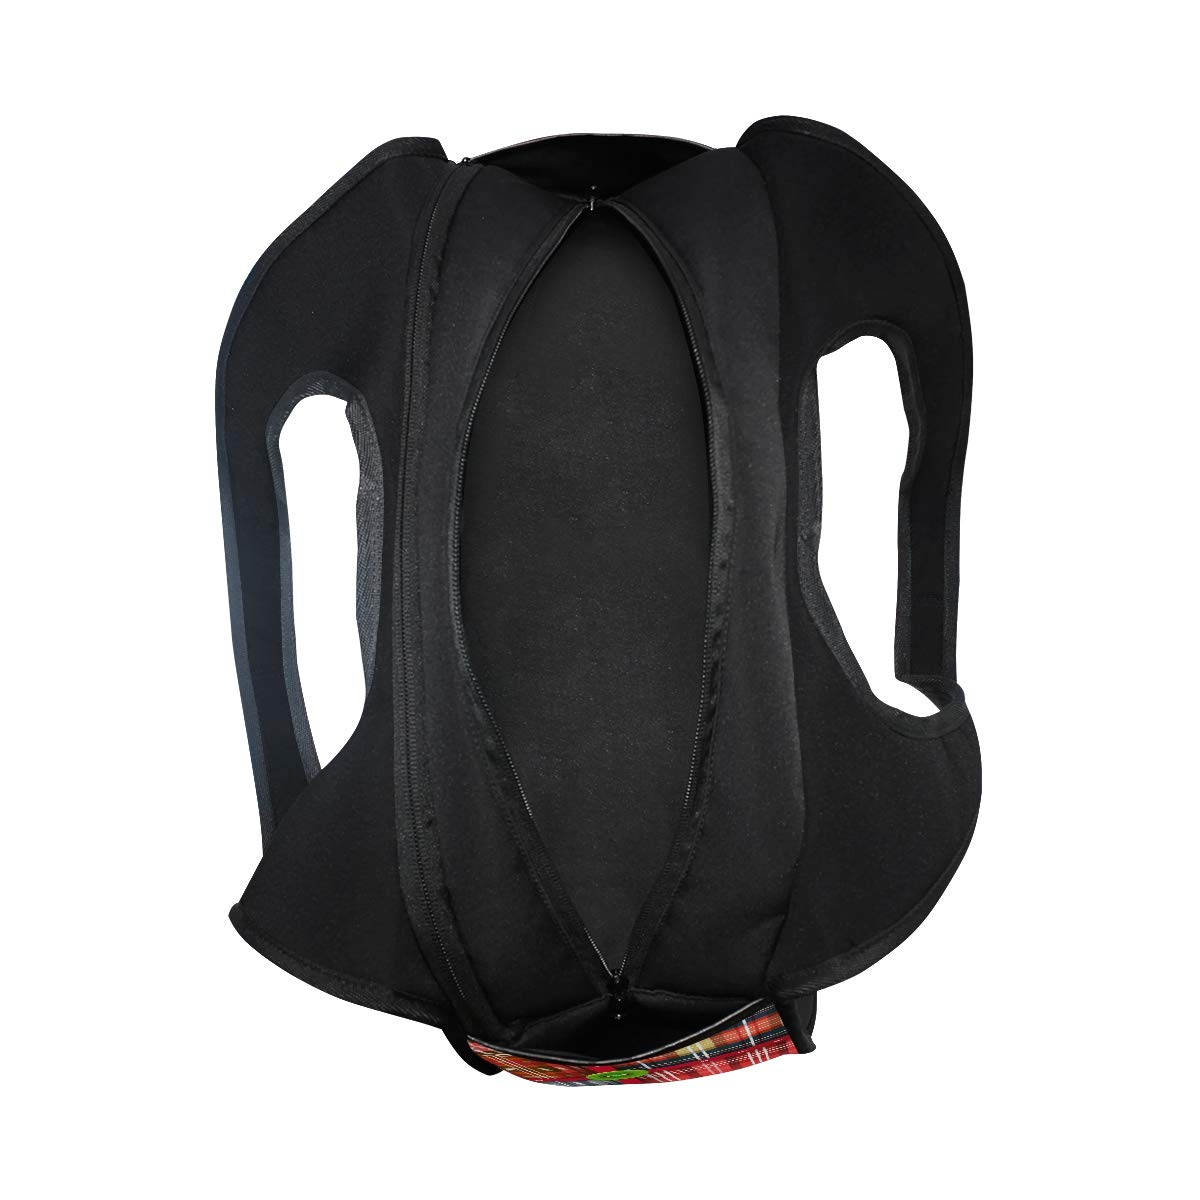 Gym Bag Sports Holdall Christmas Plaid Canvas Shoulder Bag Overnight Travel Bag for Men and Women